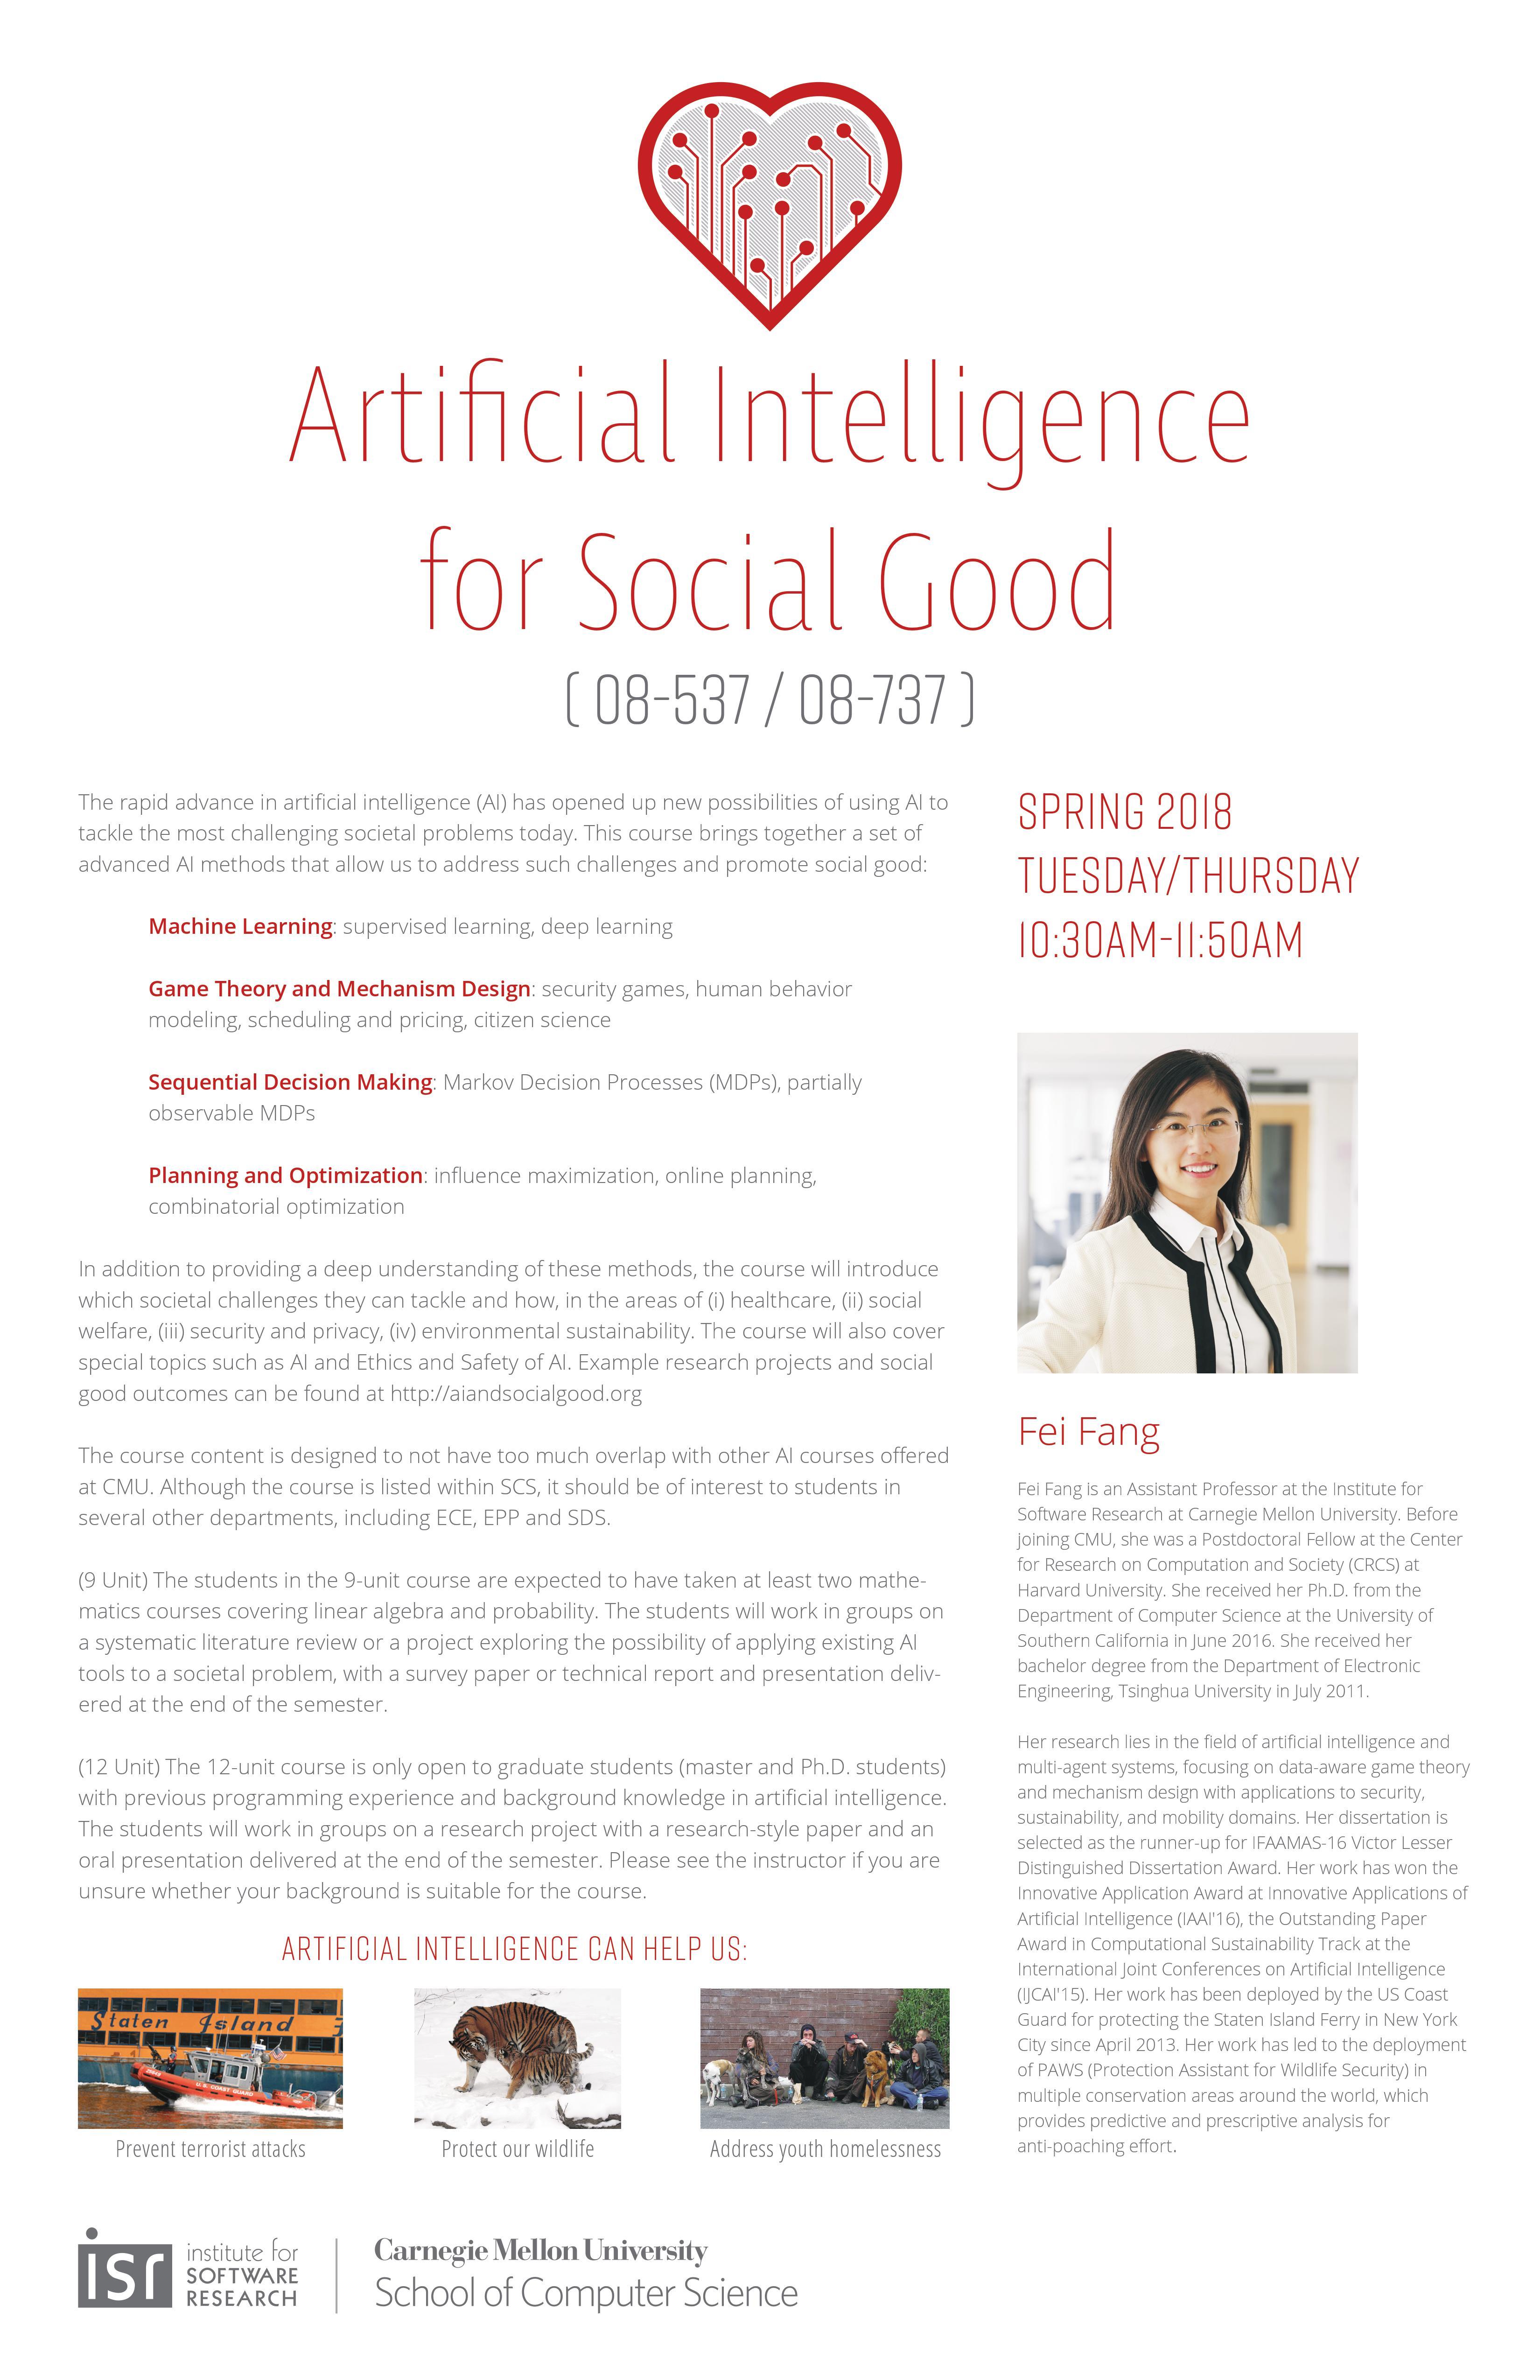 Artificial Intelligence Methods for Social Good (Spring 2018